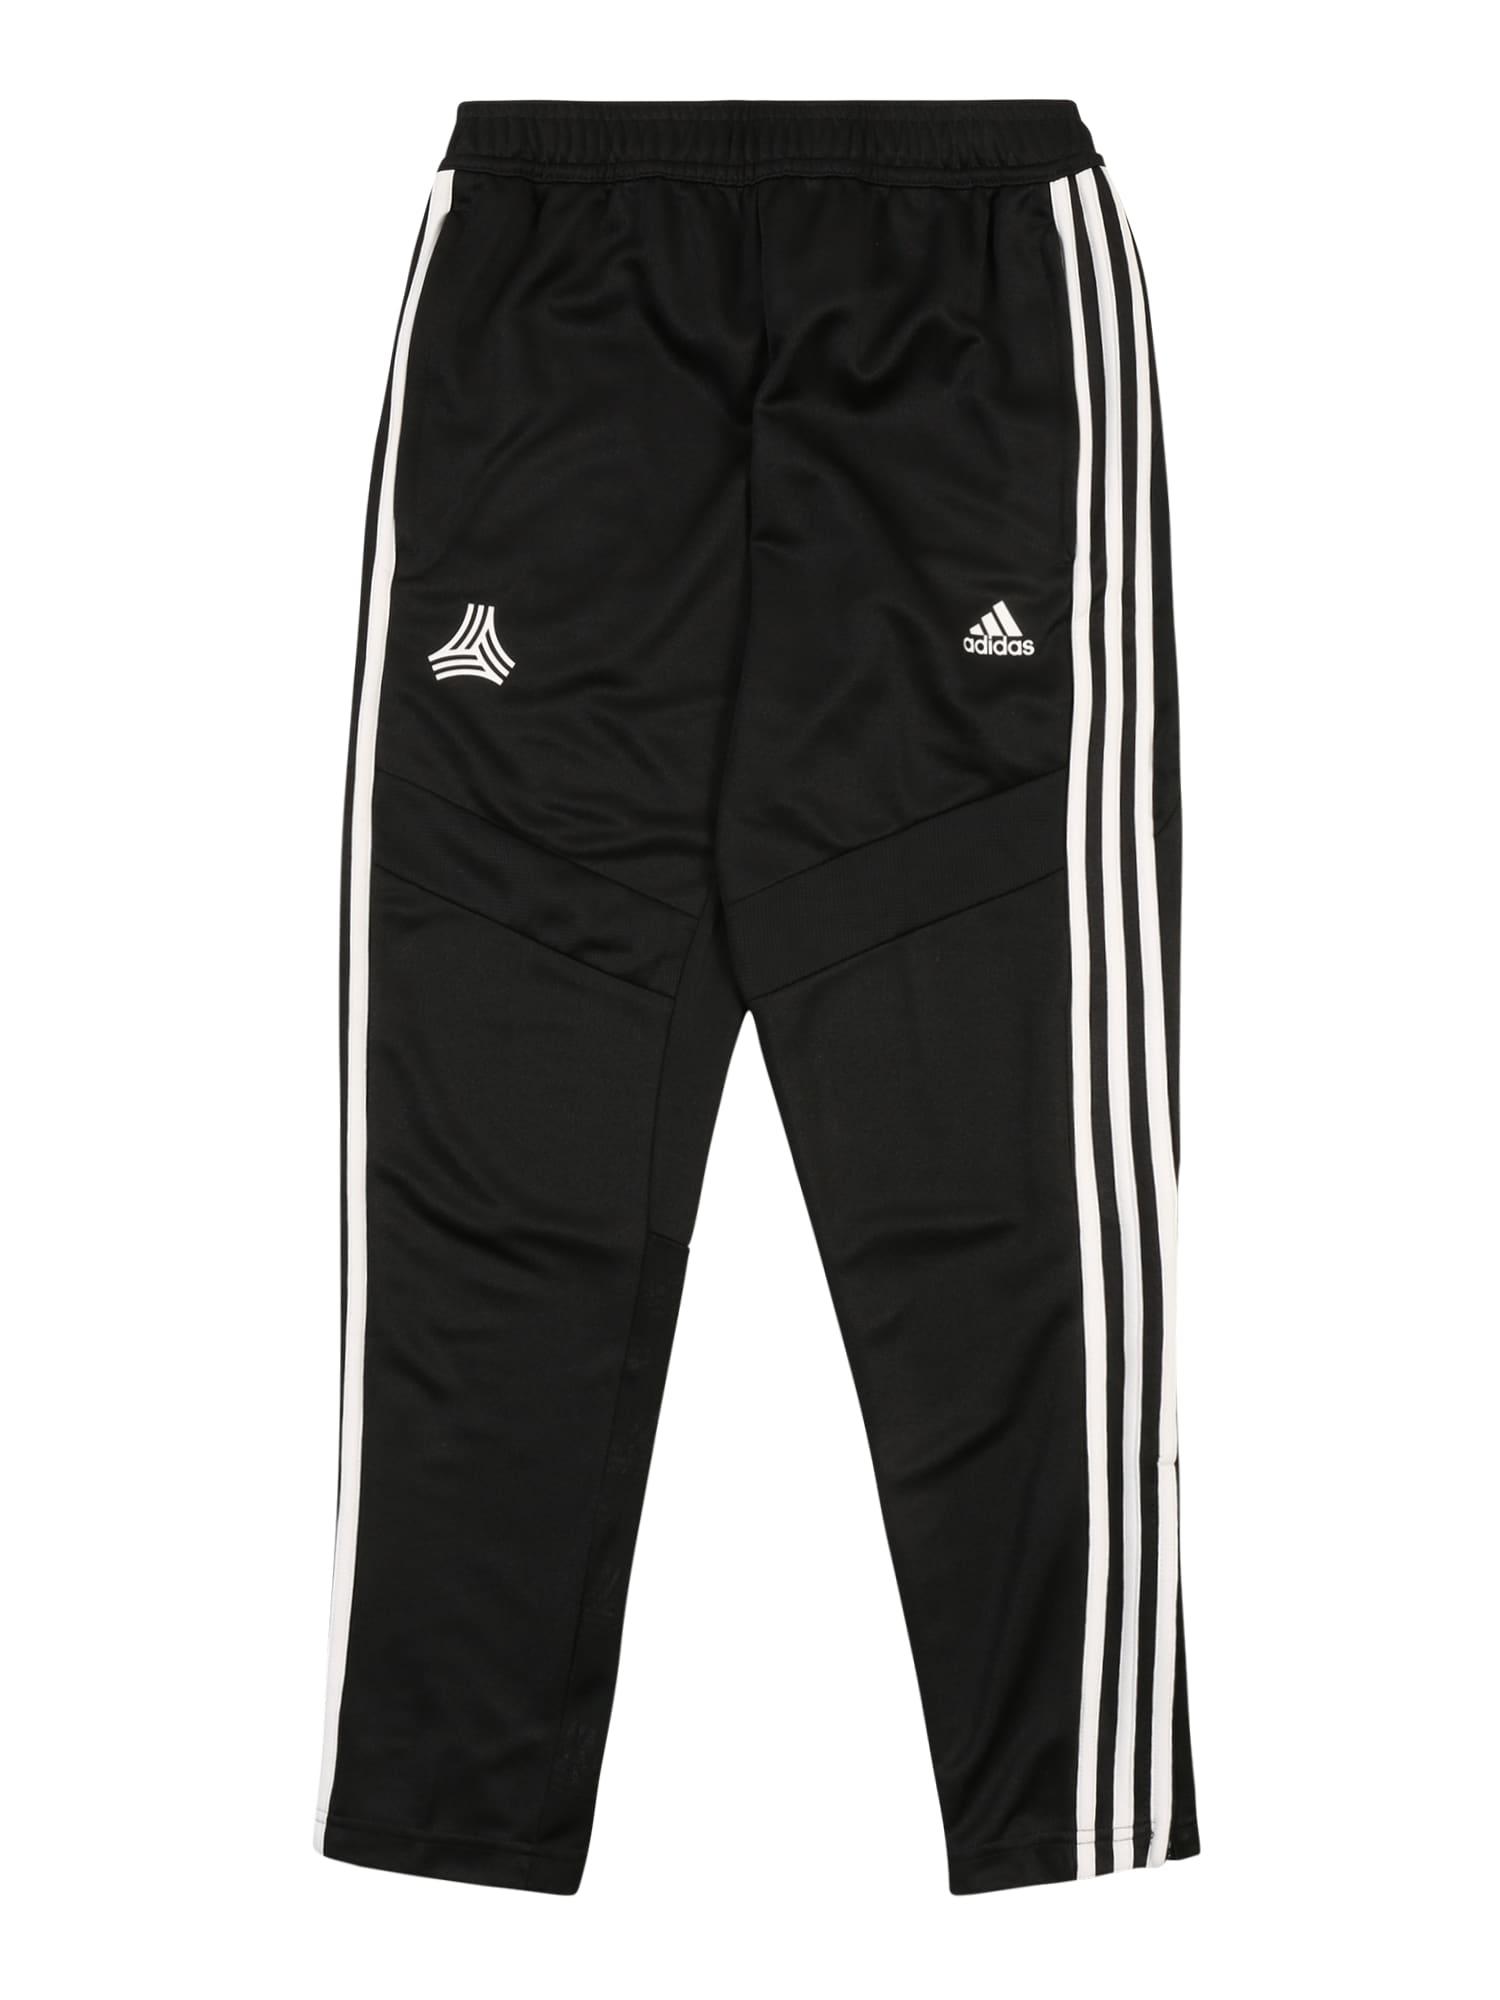 ADIDAS PERFORMANCE Športové nohavice 'Tan'  biela / čierna